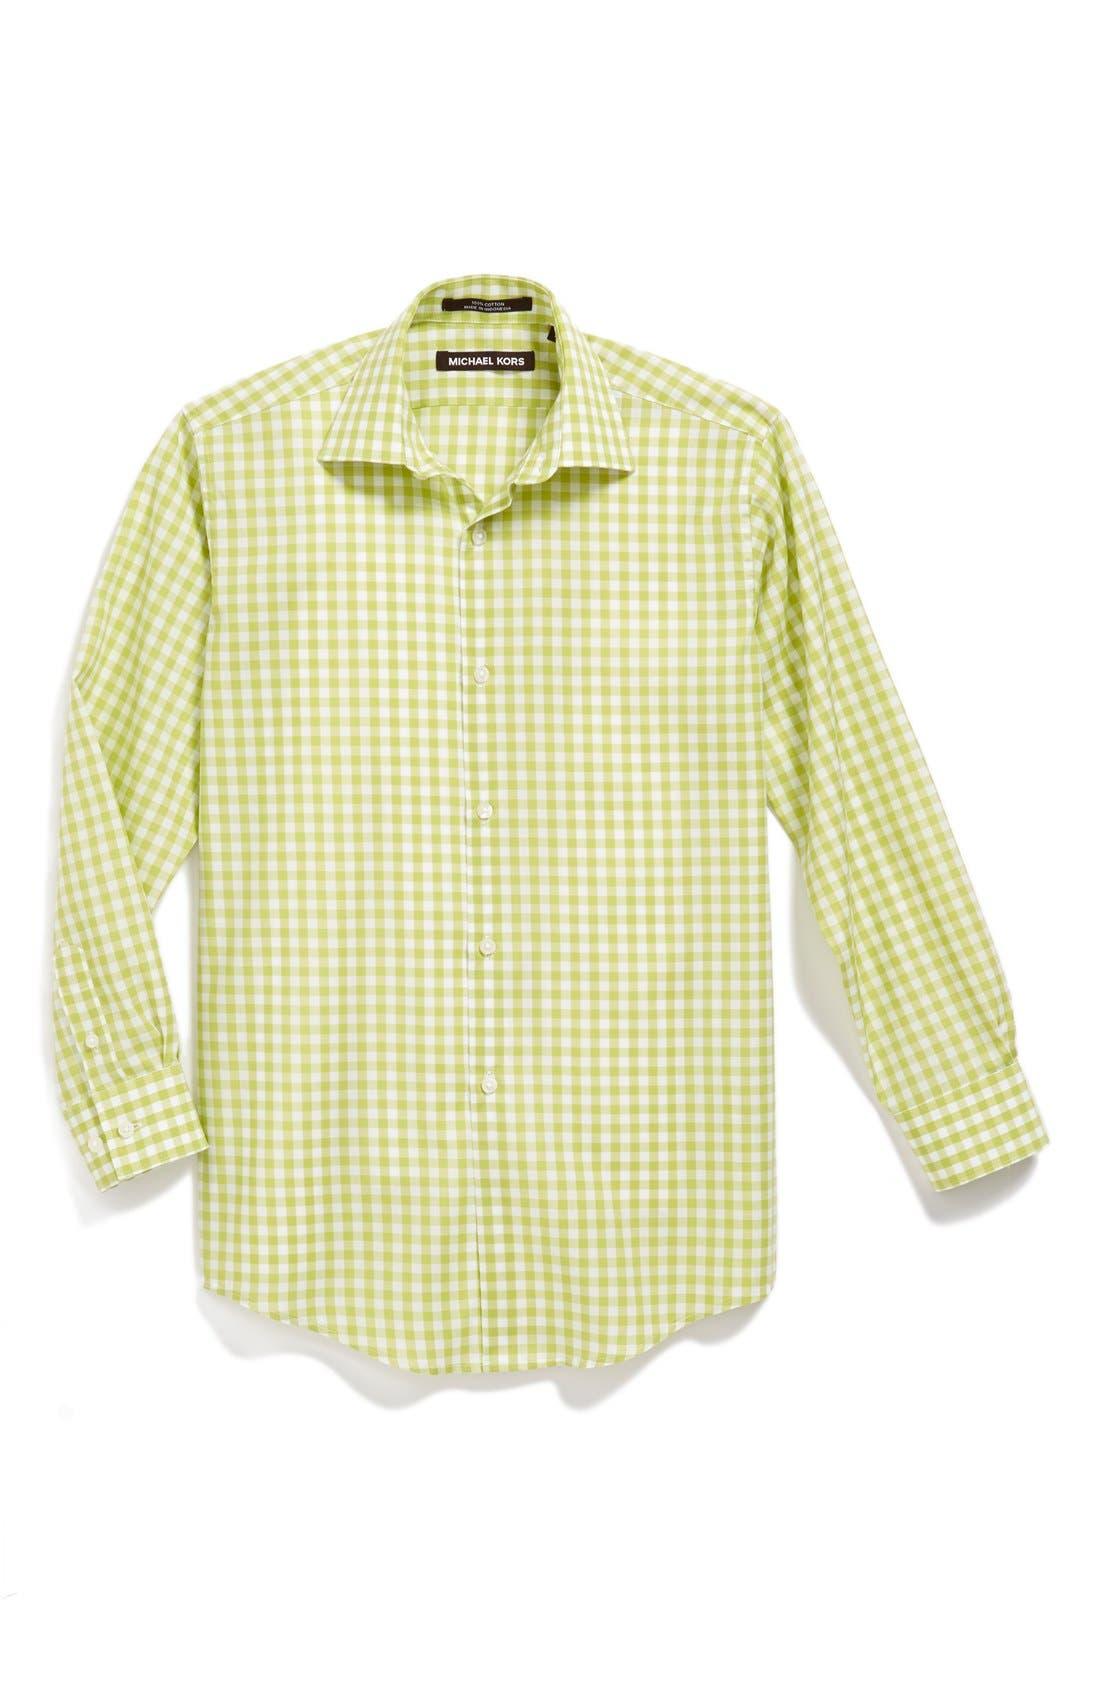 Main Image - Michael Kors Gingham Dress Shirt (Big Boys)